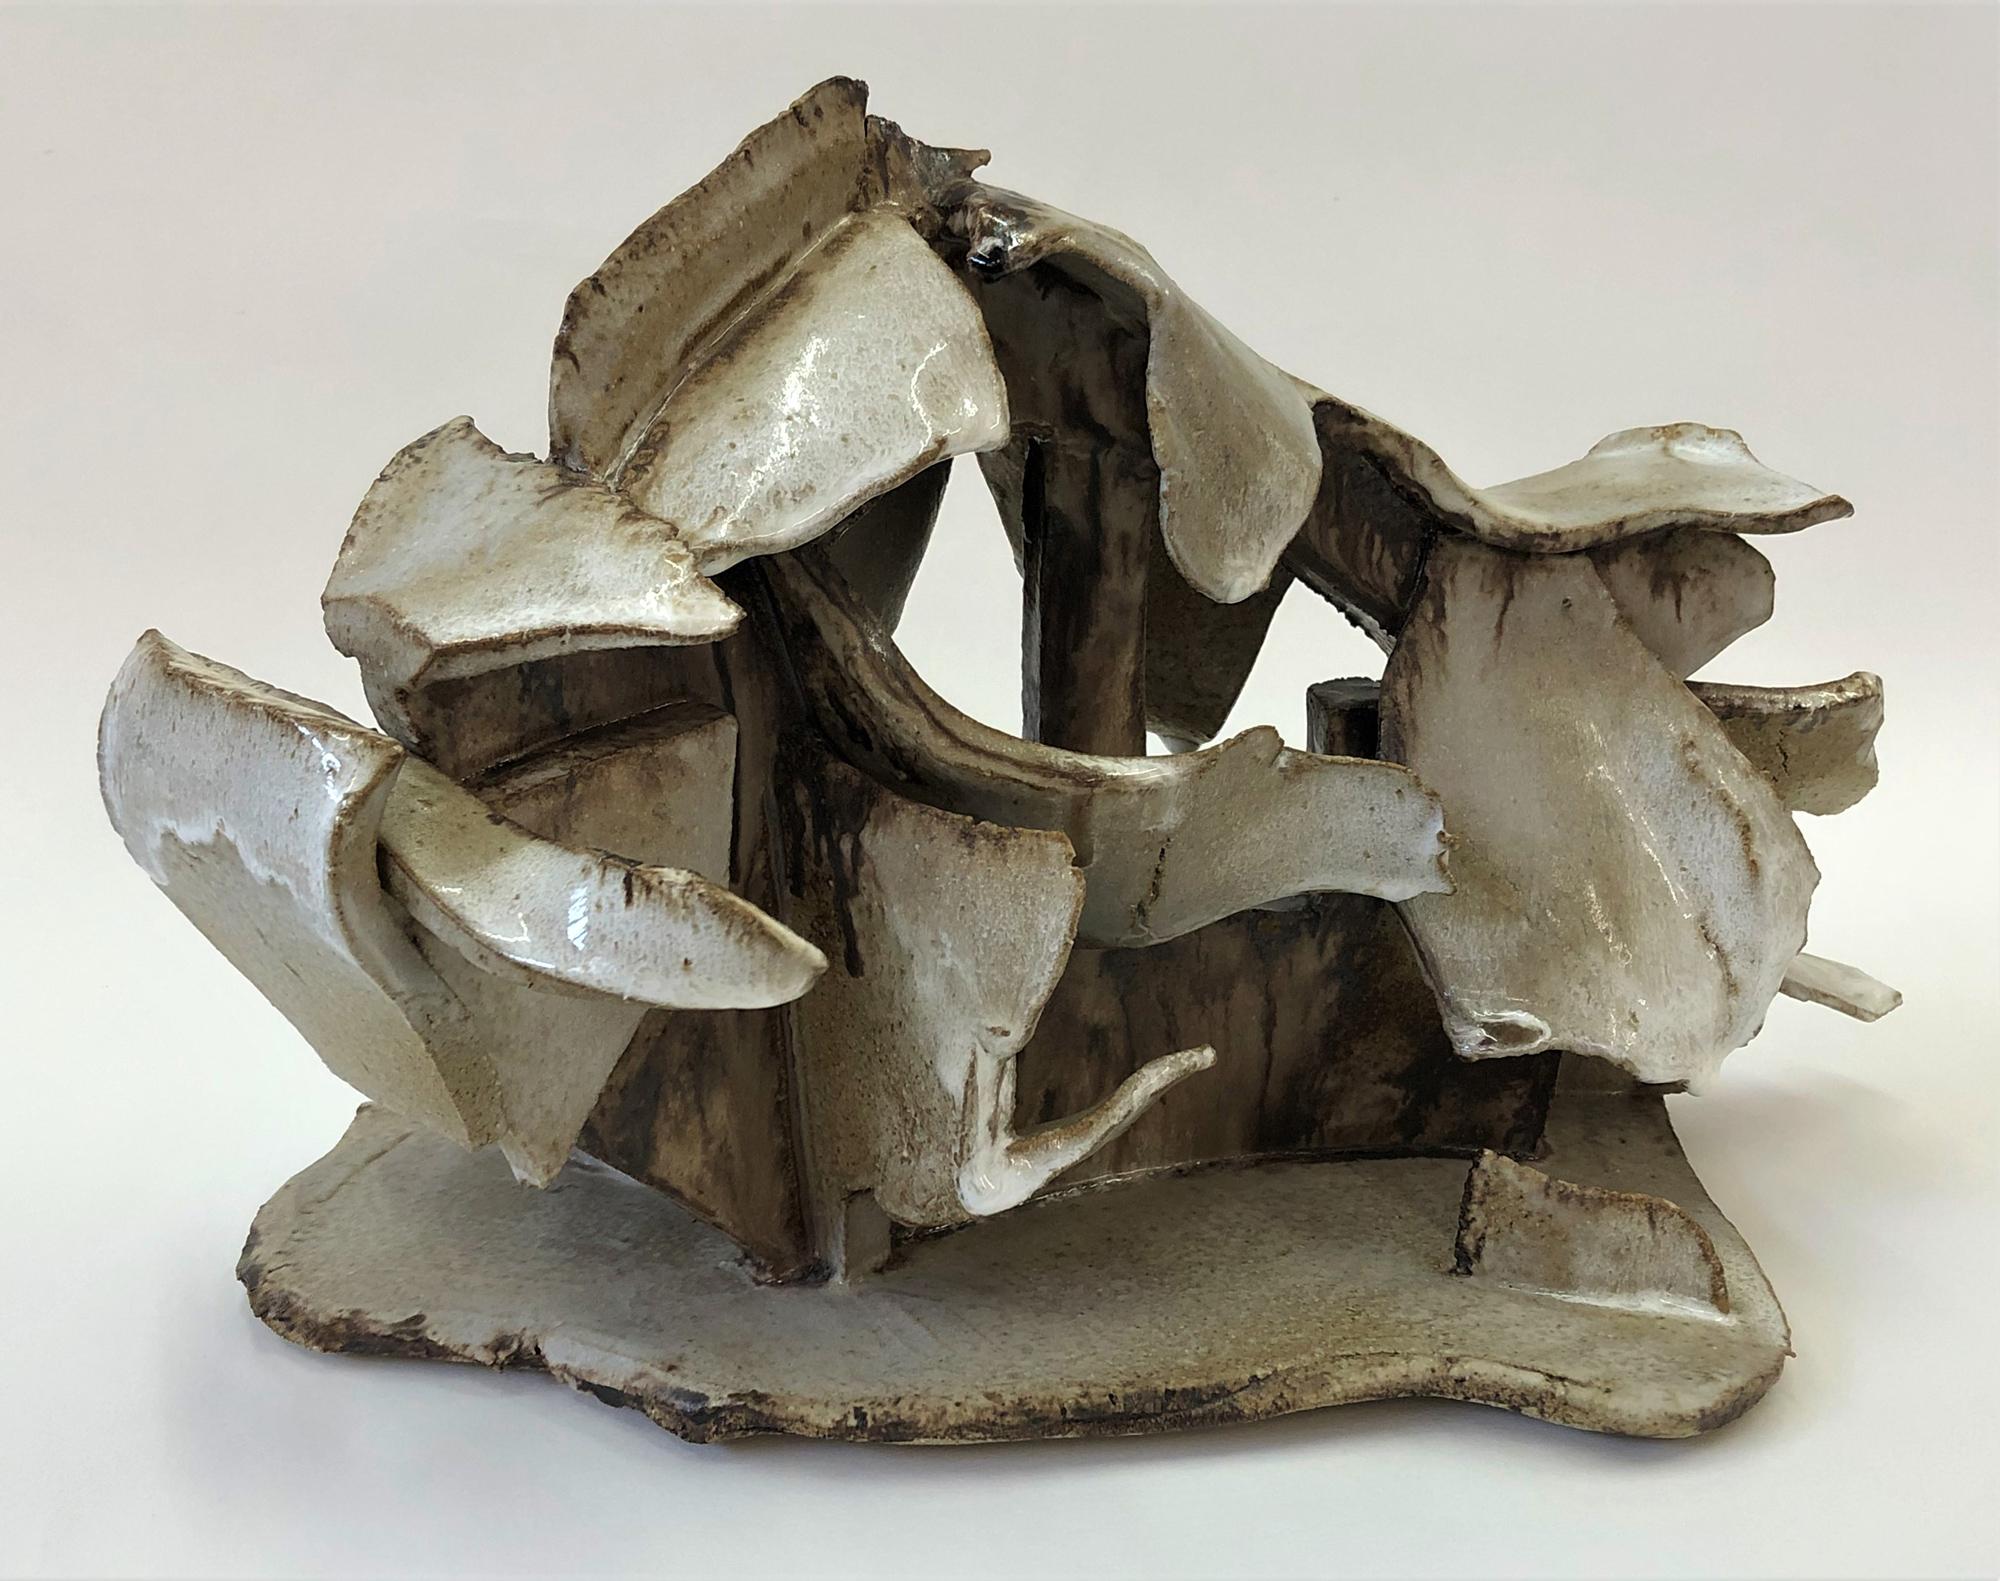 Robin Muckle | Charging Bull, large | Glazed Stoneware Ceramic | 35x25x20cms | £95